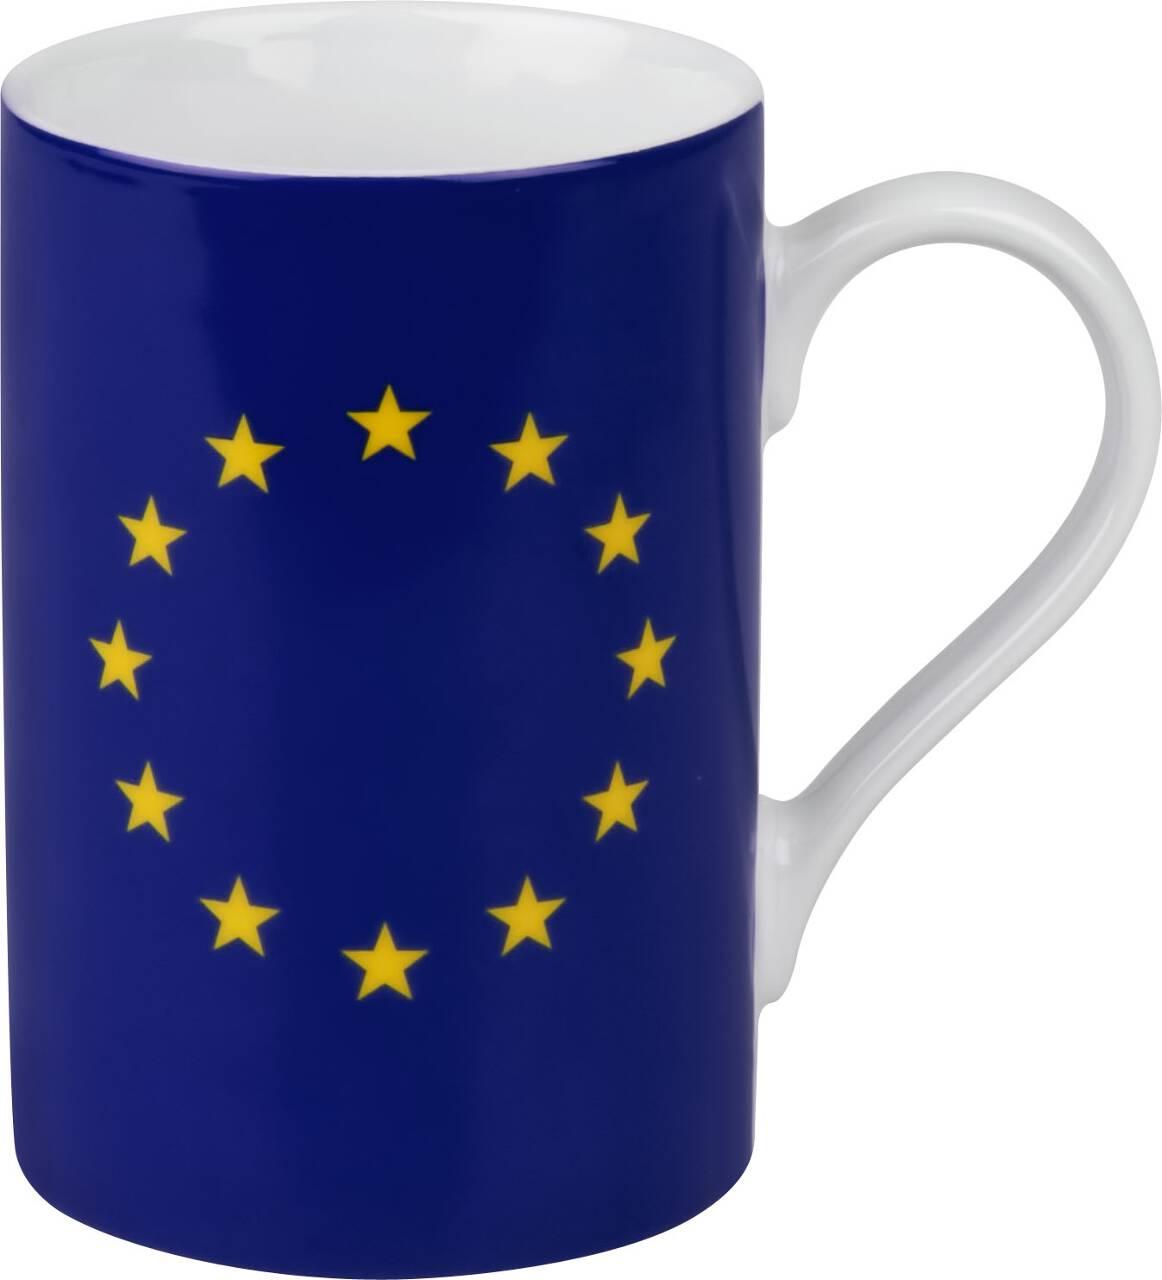 Kaffeebecher mit Motiv Europaflagge